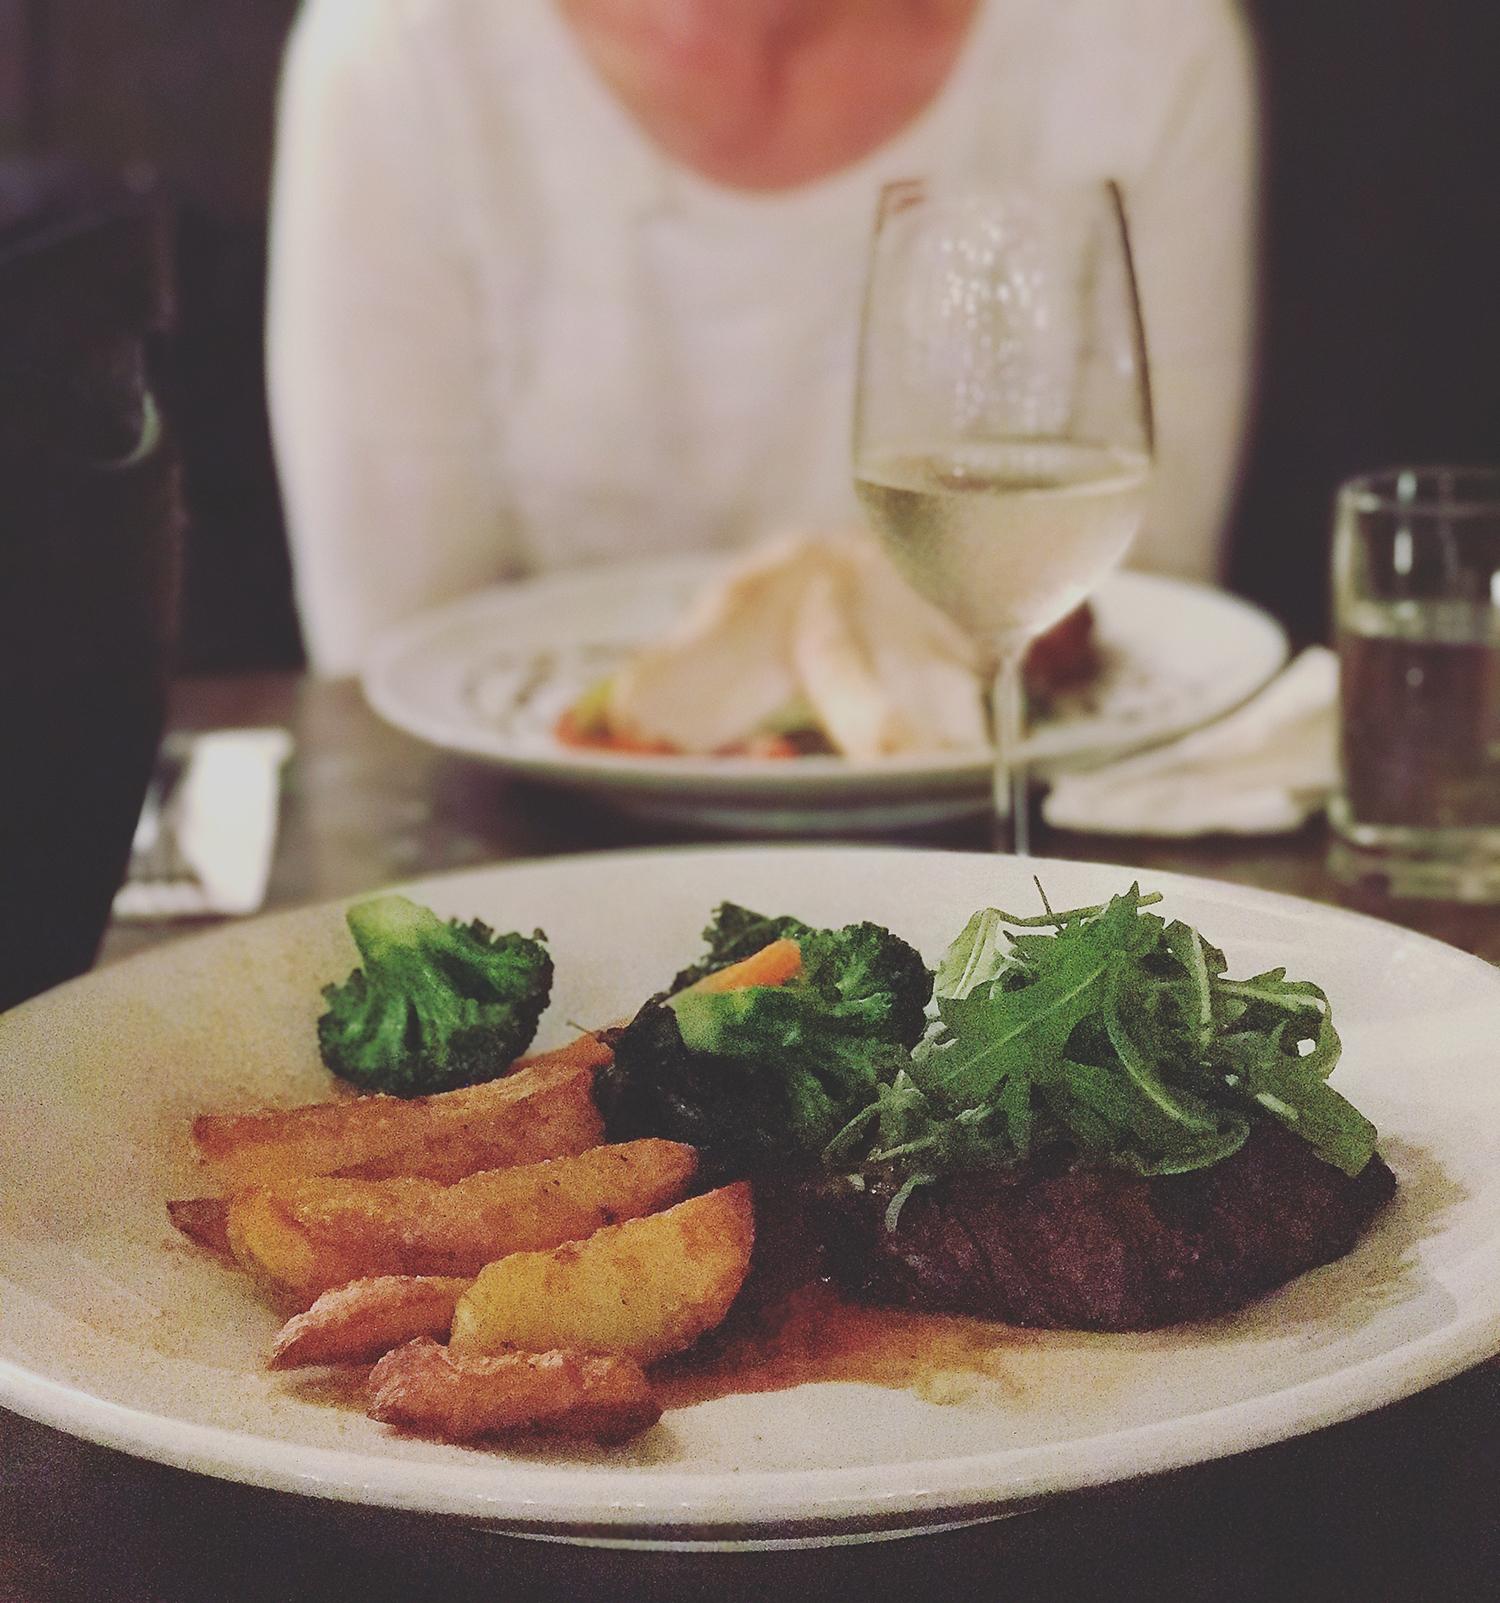 steak and chips.jpg